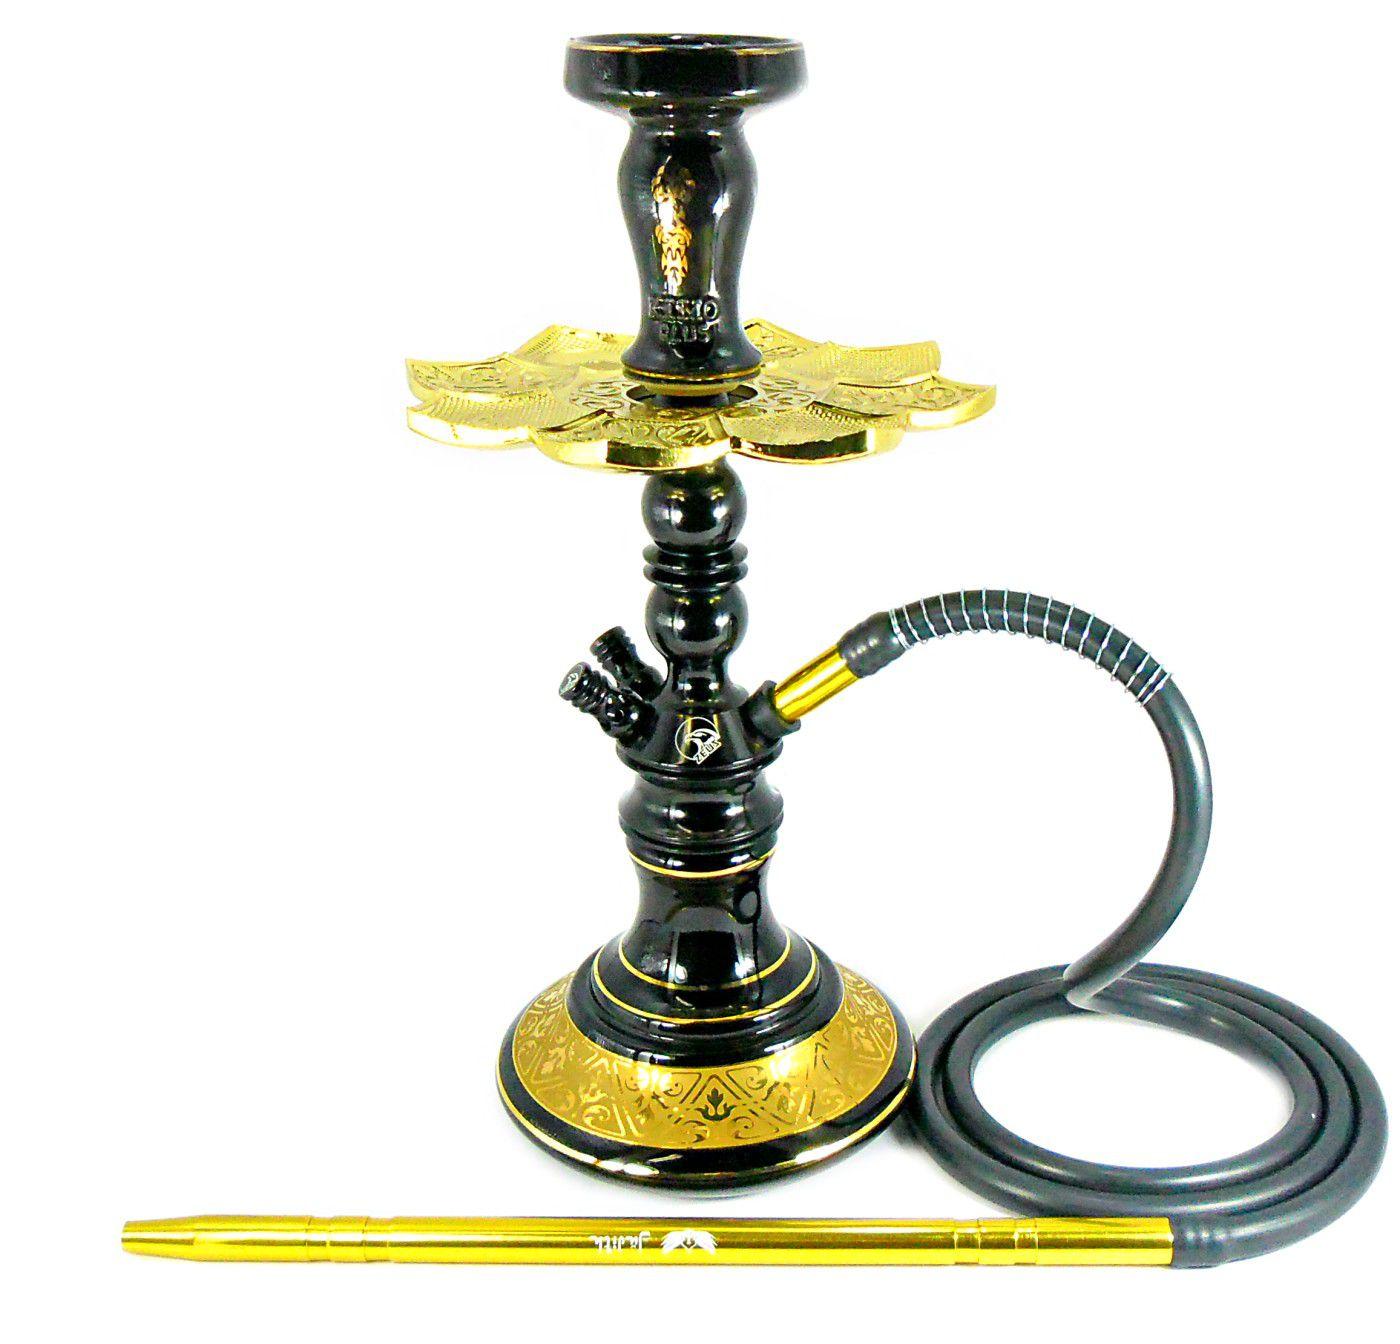 Narguile Zeus Single preto 39cm, vaso Aladin, mang. silicone, piteira e rosh Kimo preto/dourado, prato ElNefes